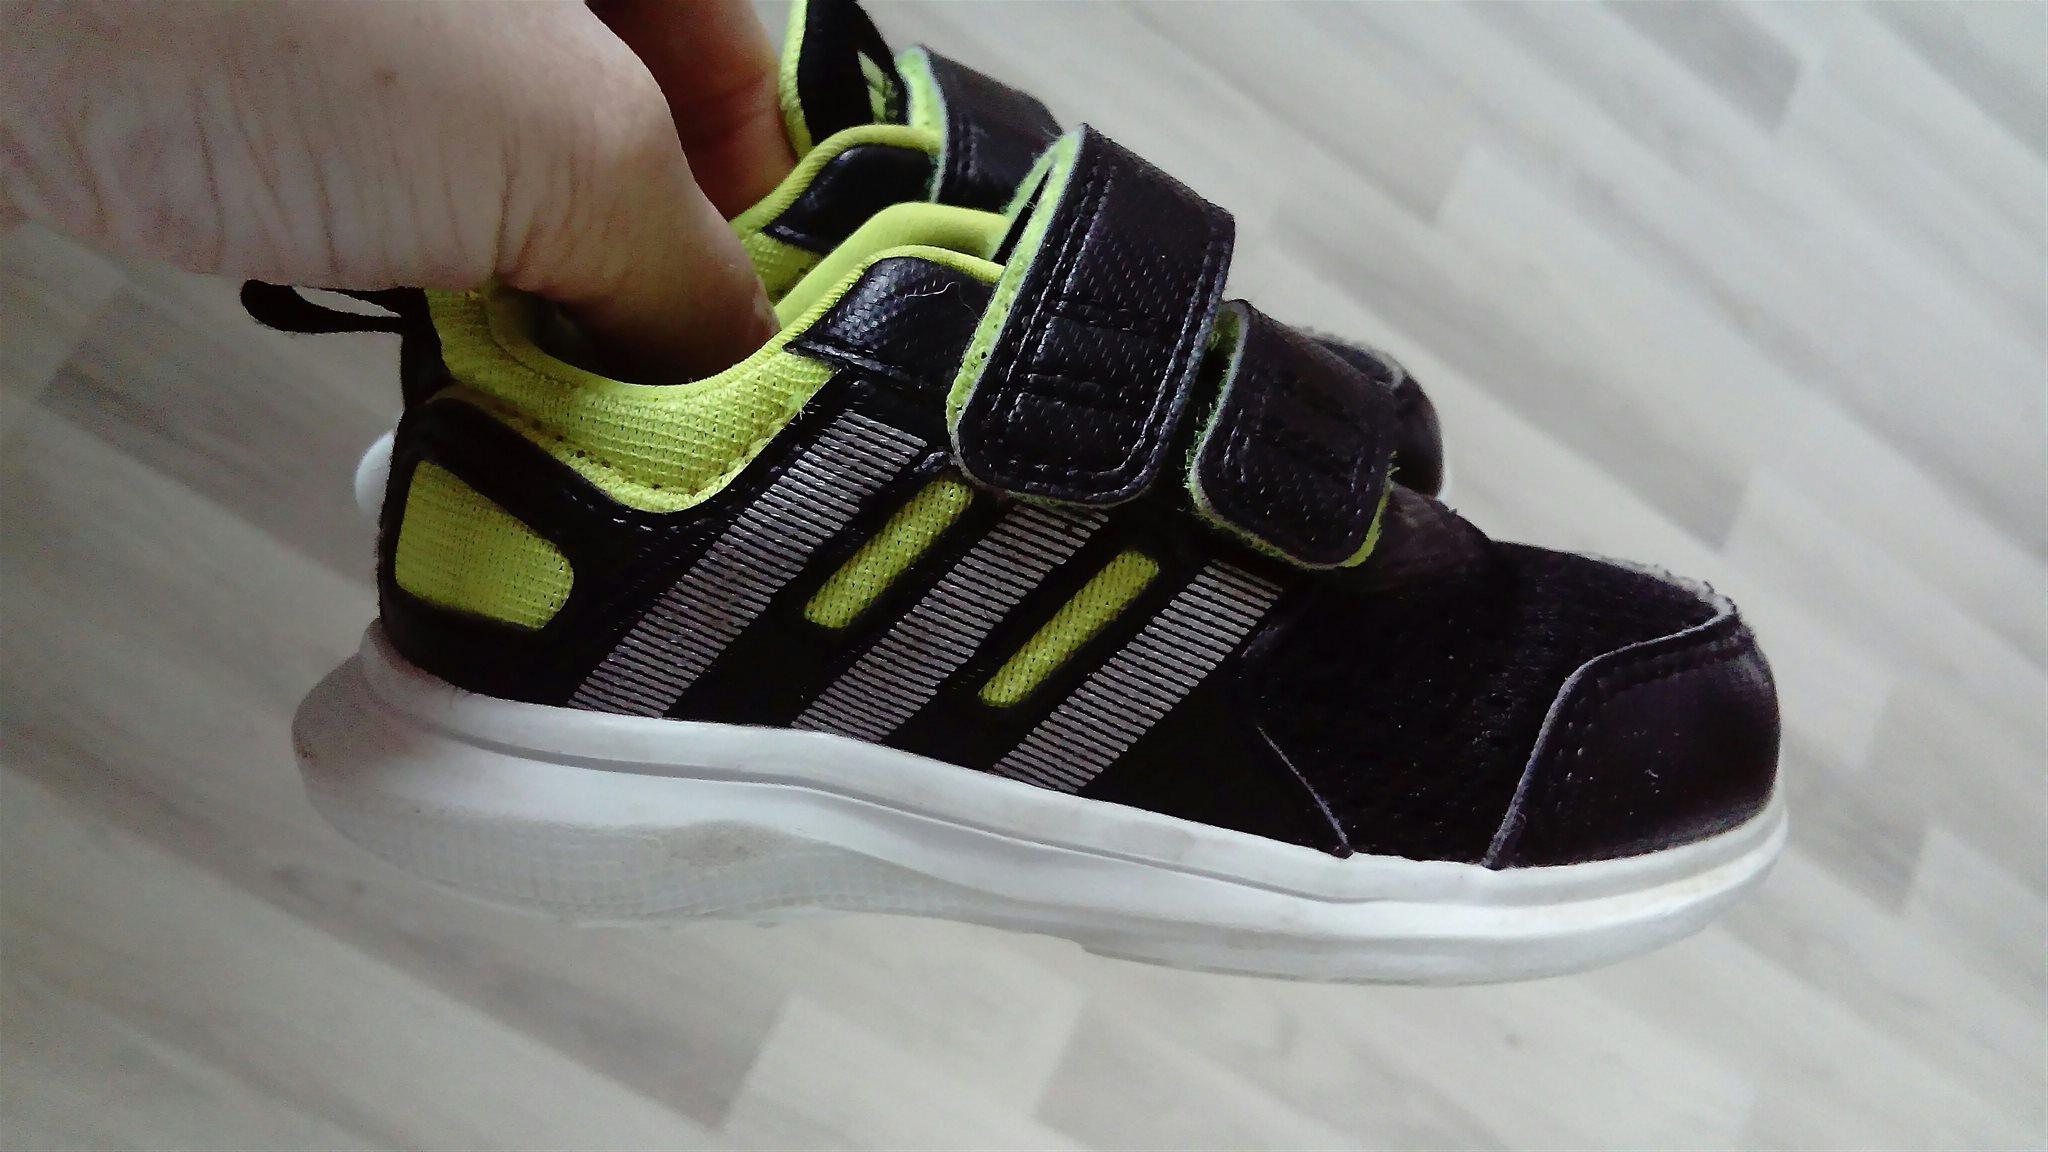 new concept dc647 23515 Adidas skor stl 22